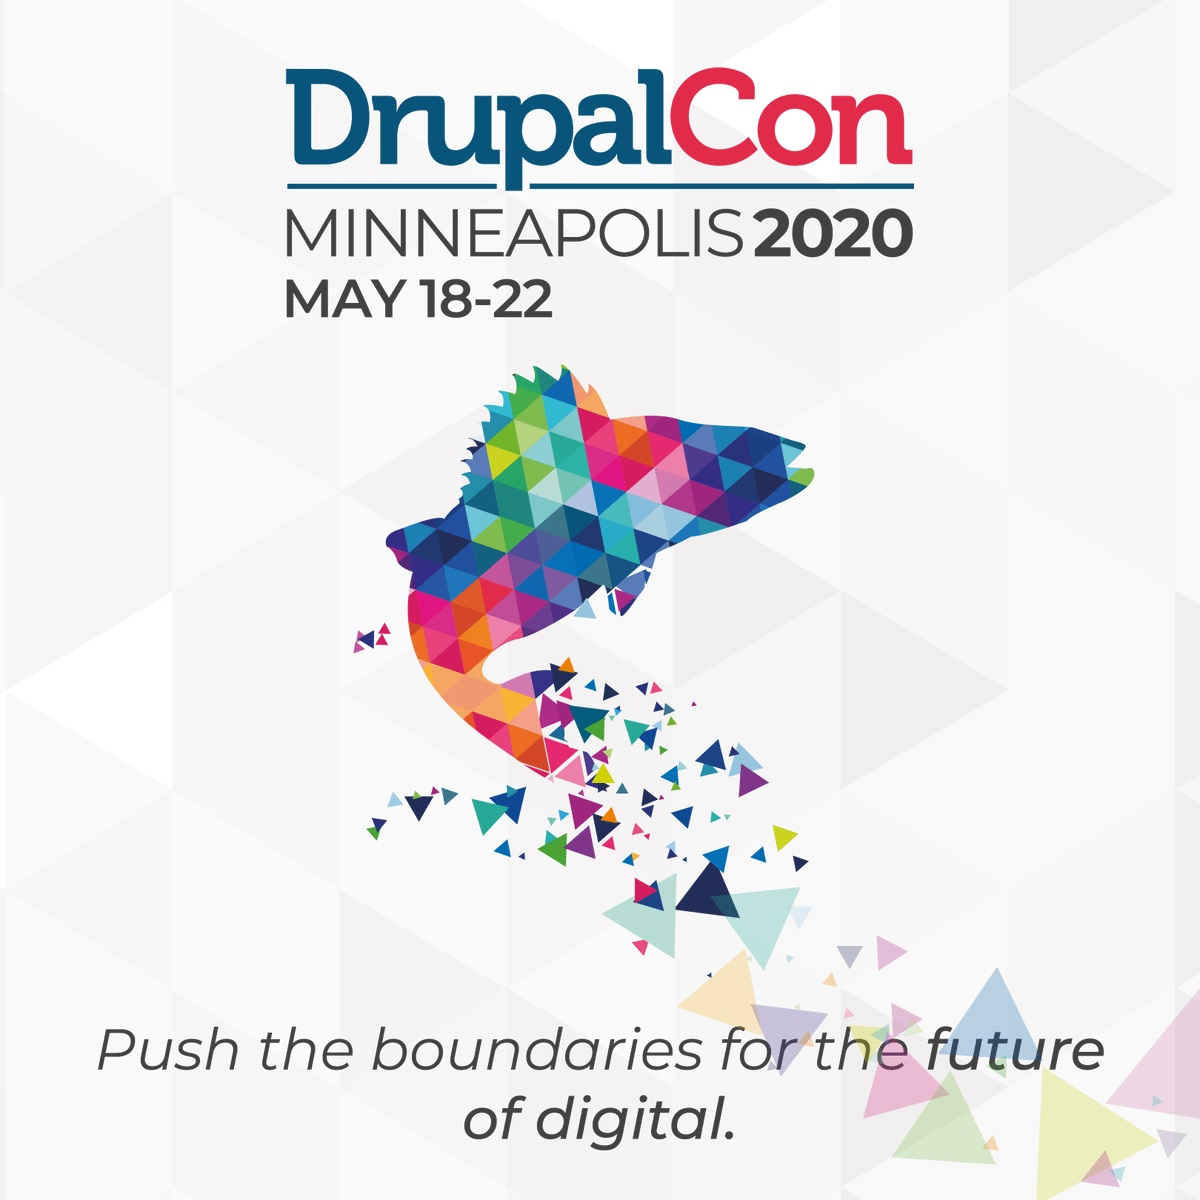 DrupalCon Minneapolis 2020